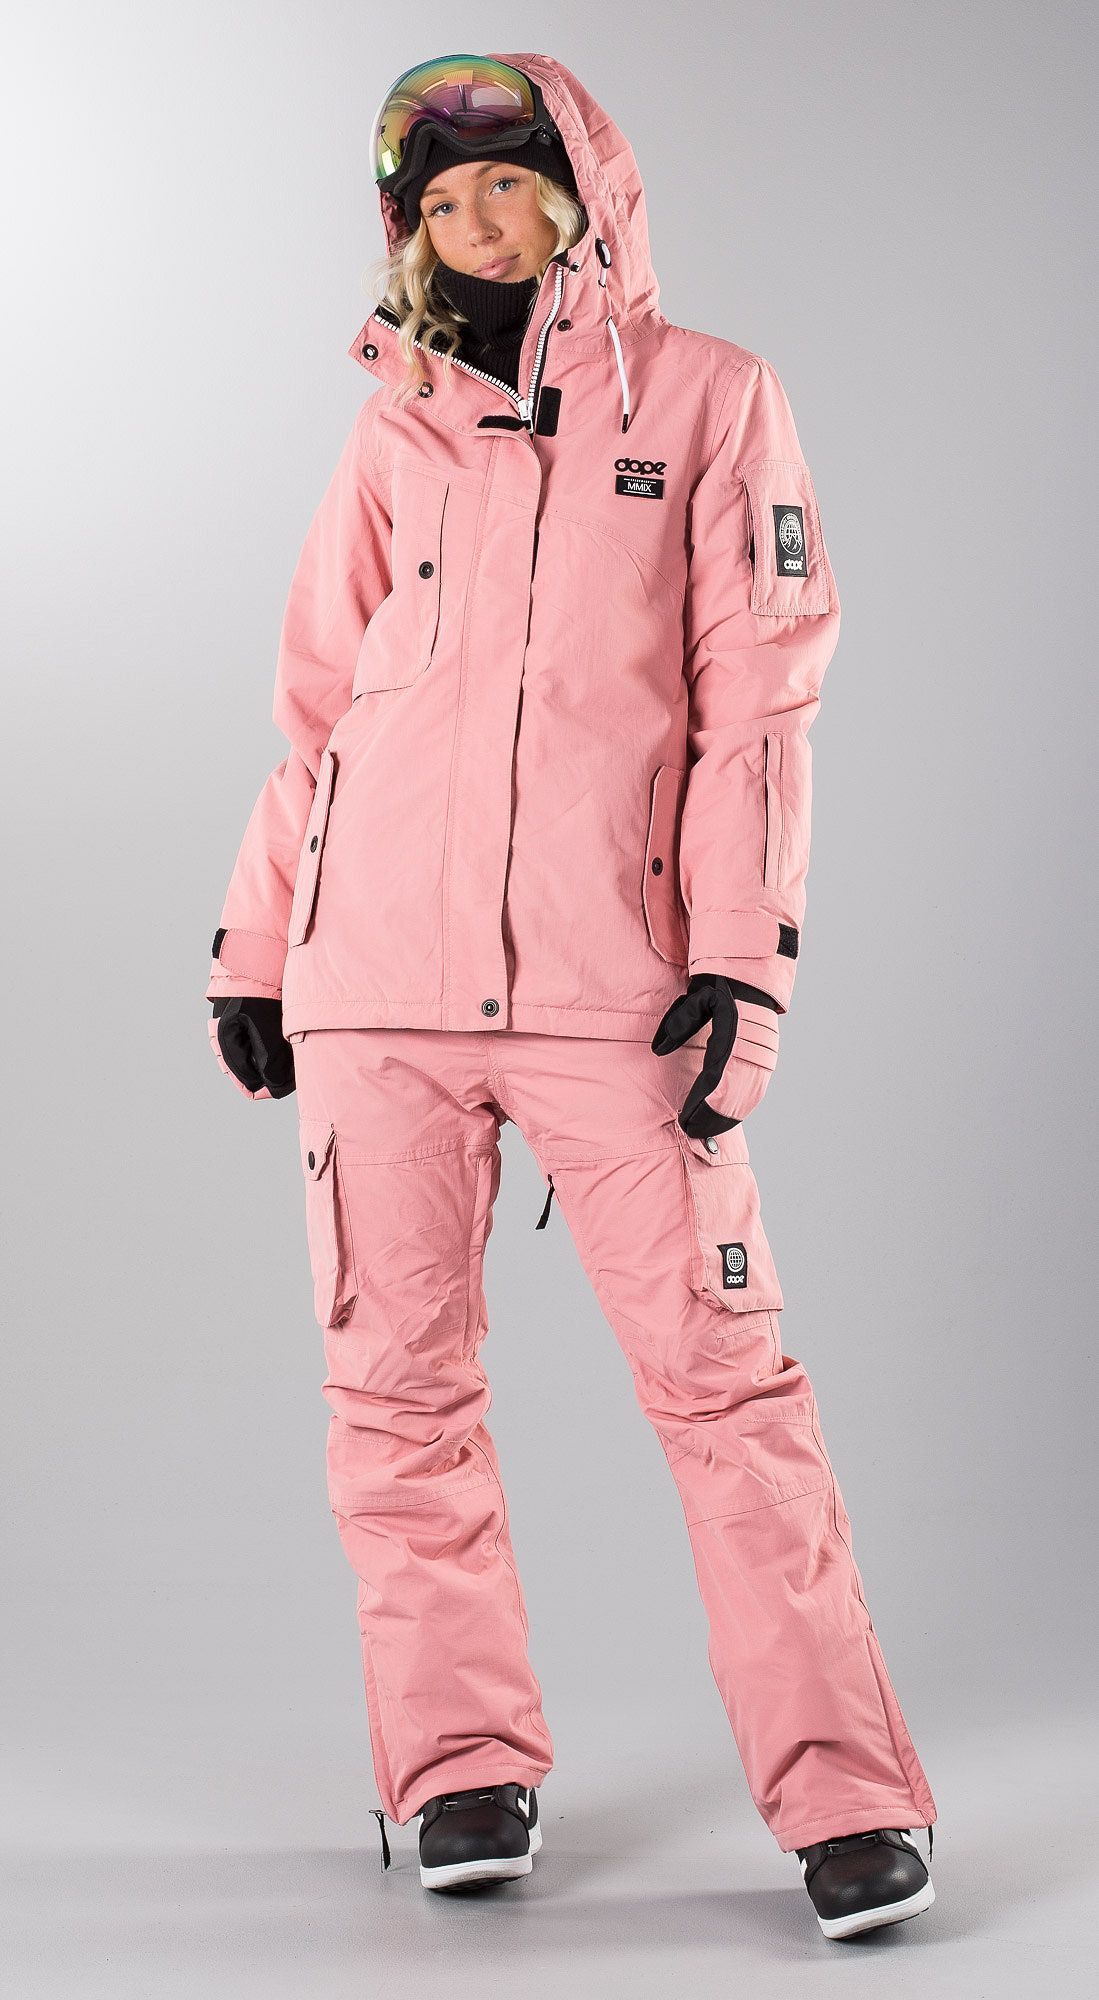 Snowboardkläder dam | Fri frakt | Stort sortiment | Ridestore.se